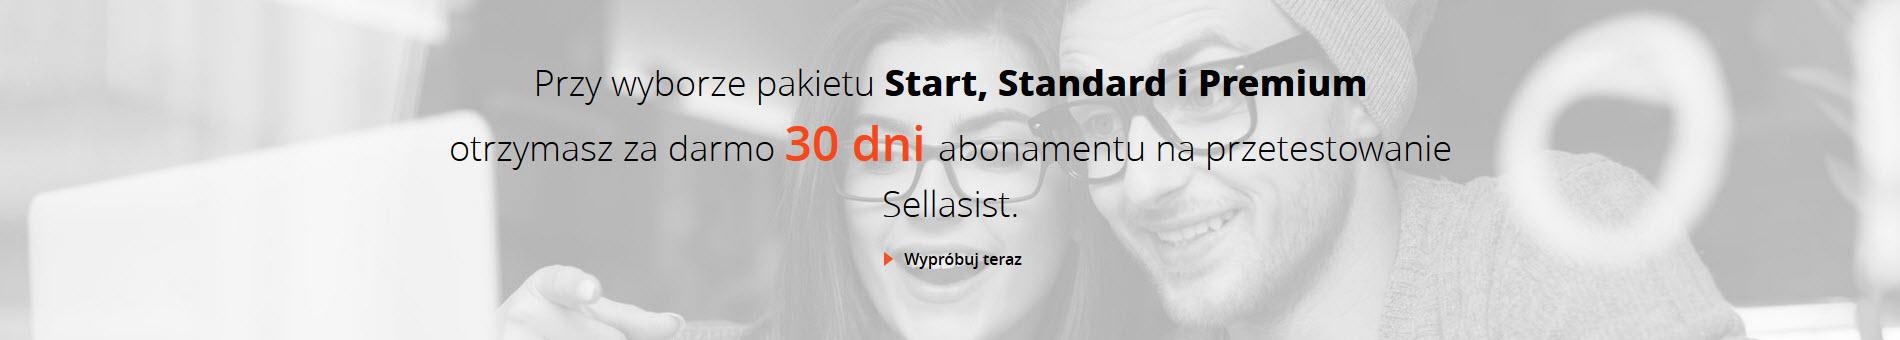 Jaki program do obsługi Allegro wybrać?, Blog Sellasist